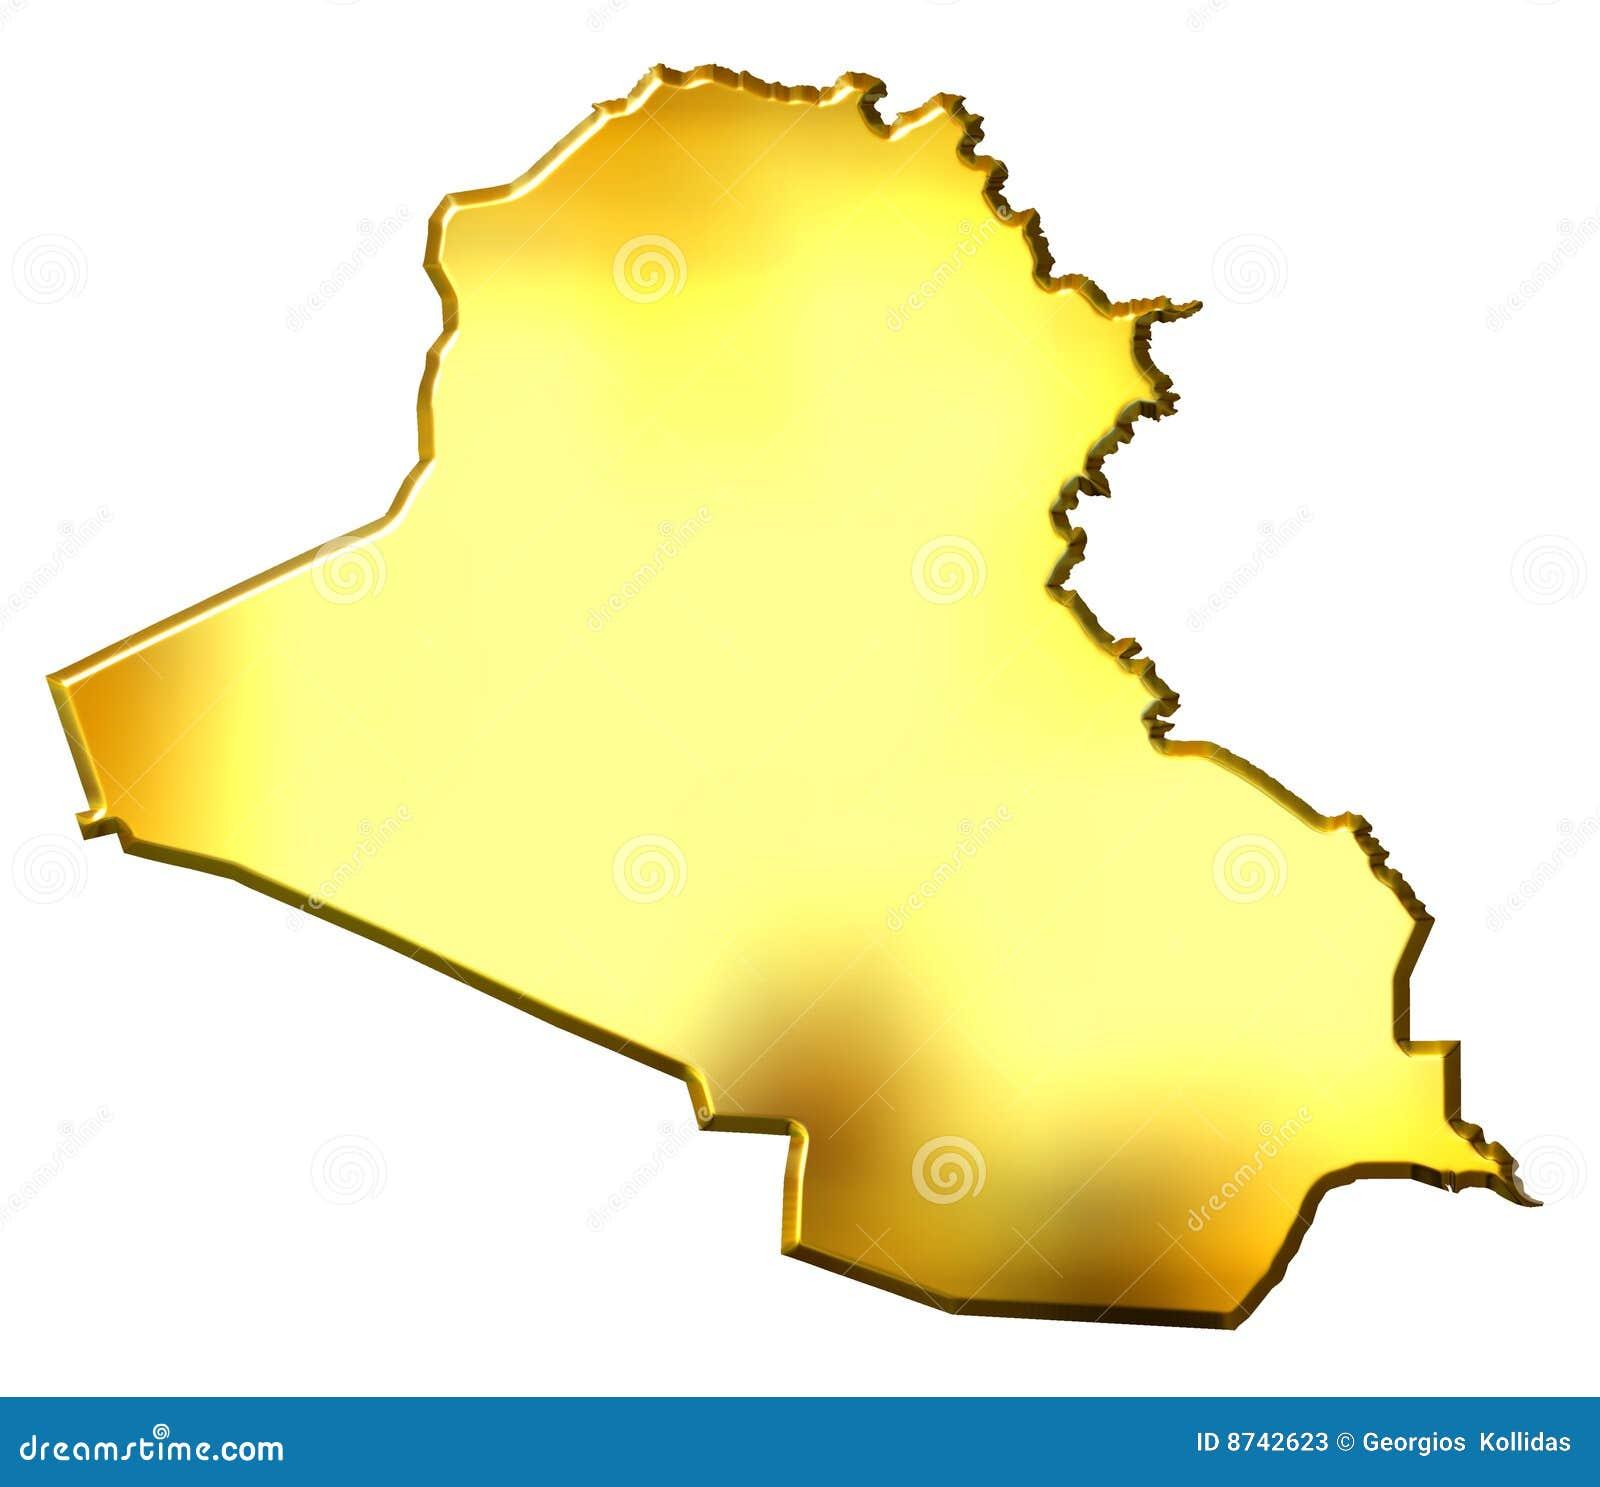 Iraq 3d golden map stock illustration illustration of iraq 8742623 iraq 3d golden map sciox Gallery